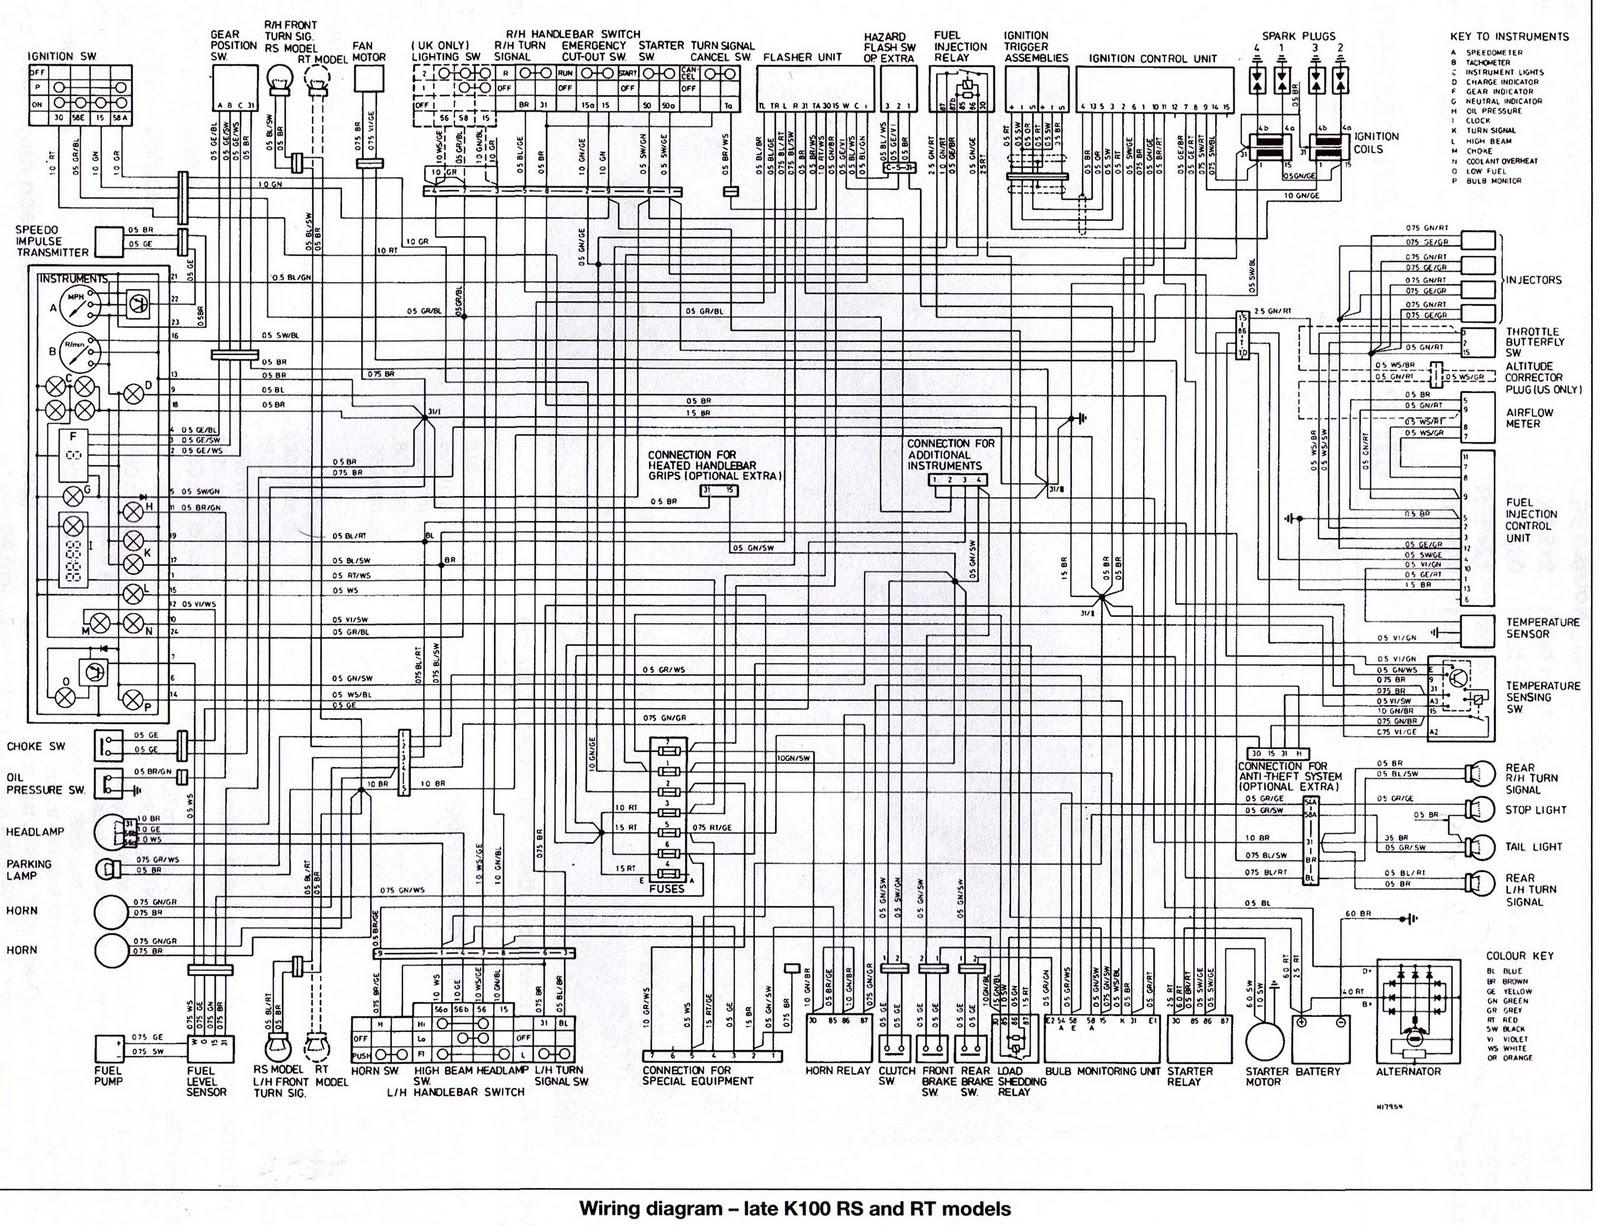 Bmw E39 M5 Wiring Diagrams - 04 Pontiac Grand Prix Fuse Box for Wiring  Diagram SchematicsWiring Diagram Schematics